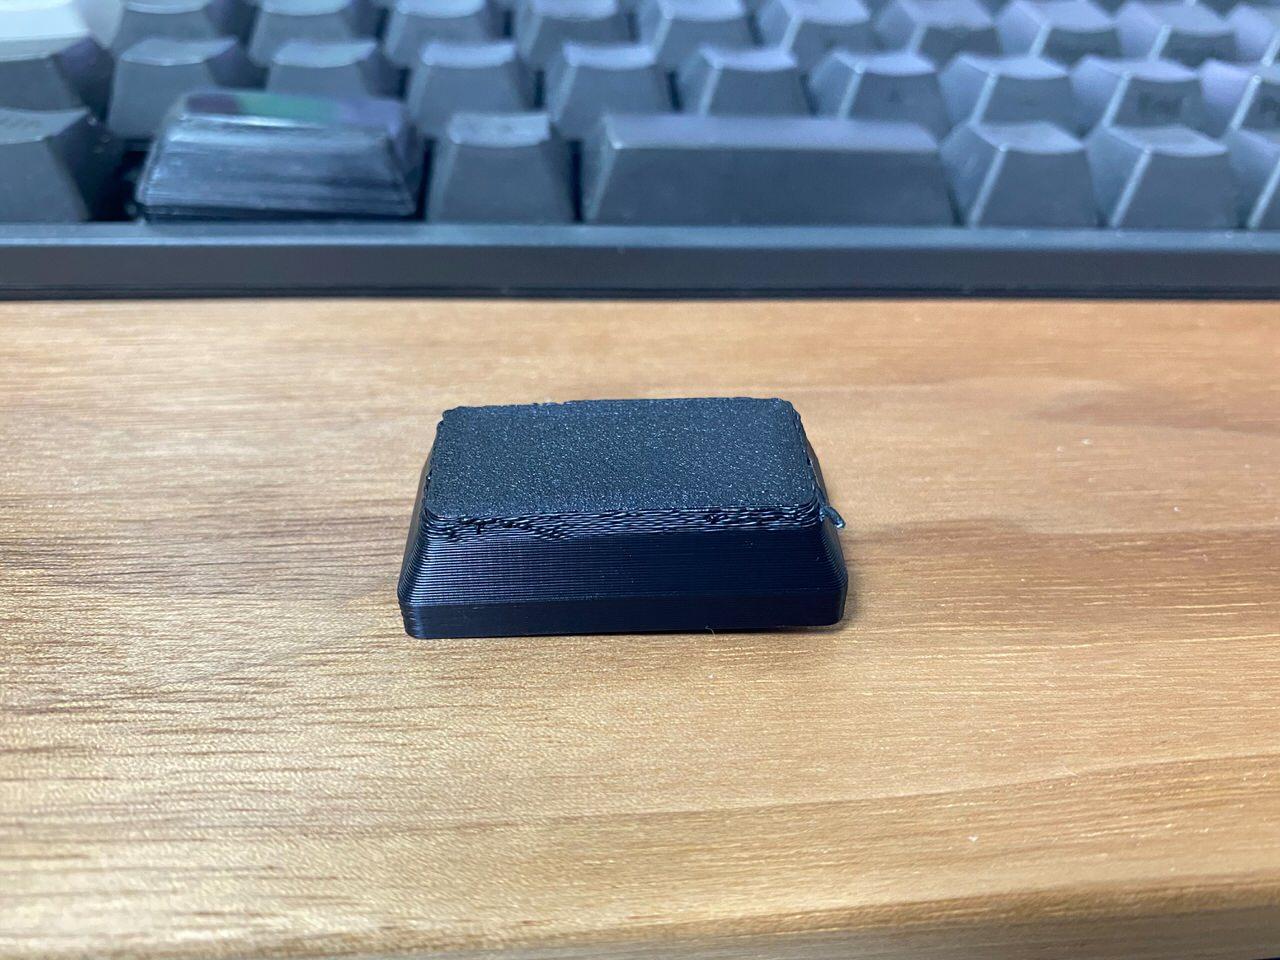 【HHKB】キートップを3Dプリンターで自作する【その2】 02